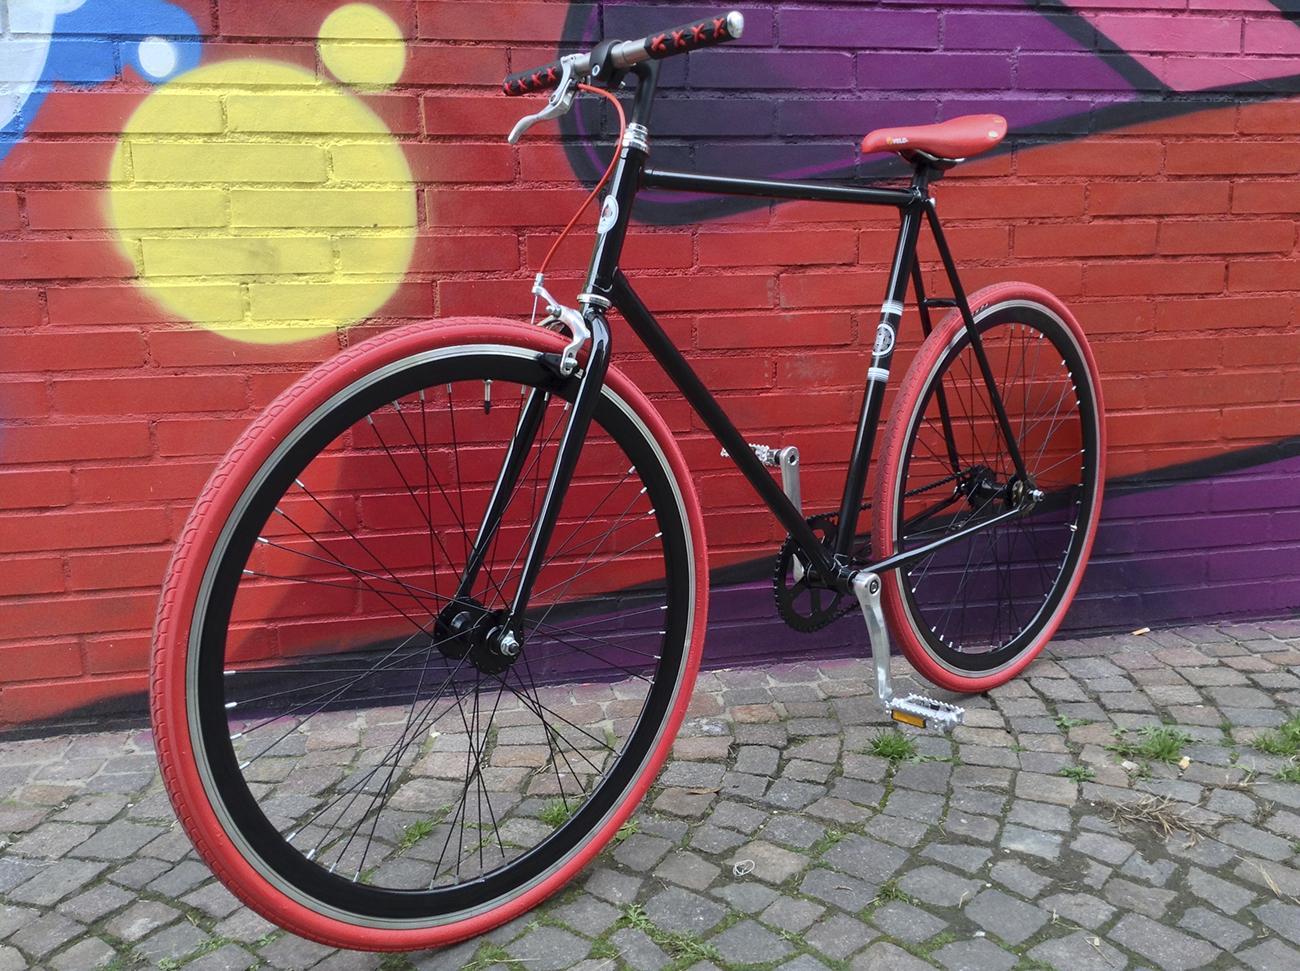 bici-scattofisso-urbana4